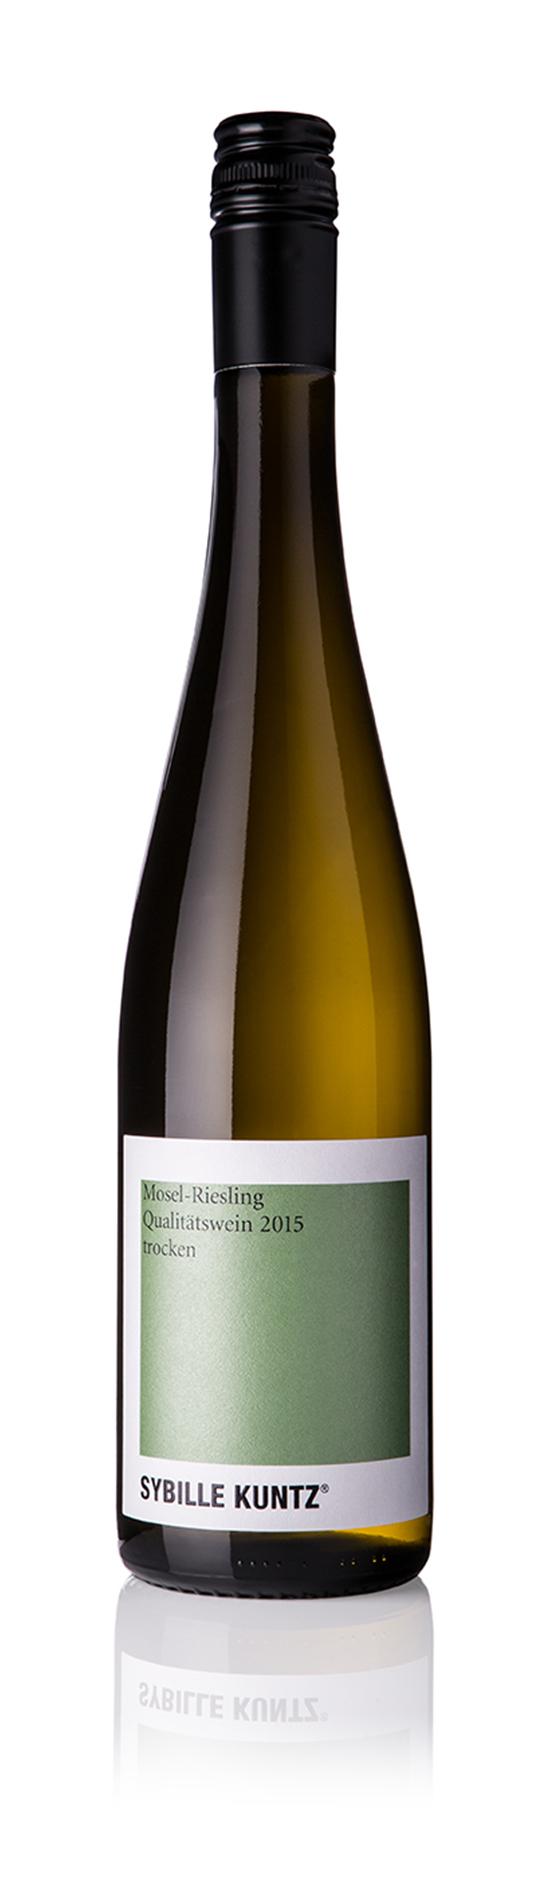 2015 SYBILLE KUNTZ Mosel-Riesling Qualitätswein trocken 0,75 l